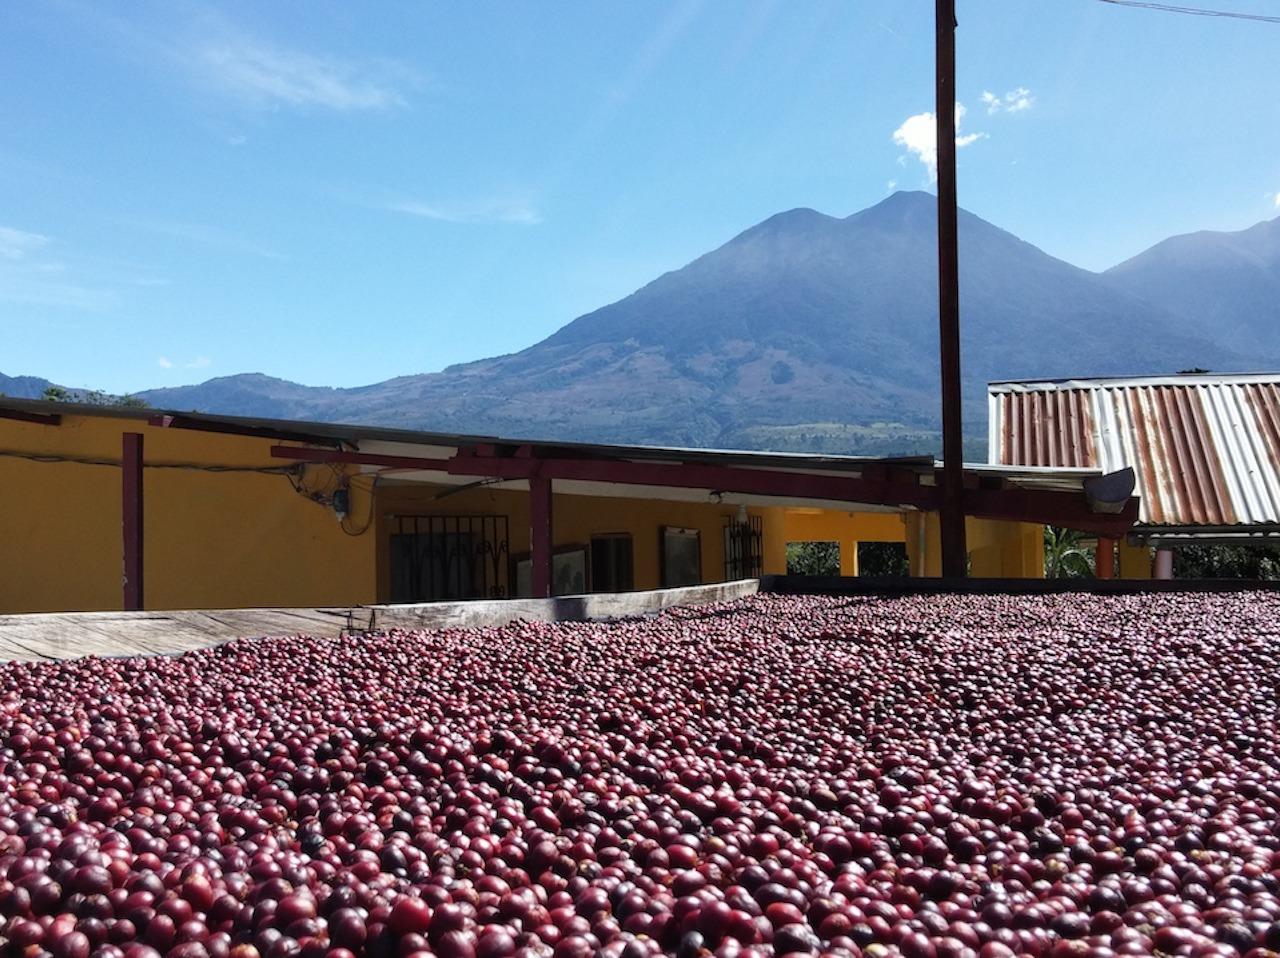 anbassa-artisan-torrefacteur-cafe-guatemala-blackhoney-montedeoro-1